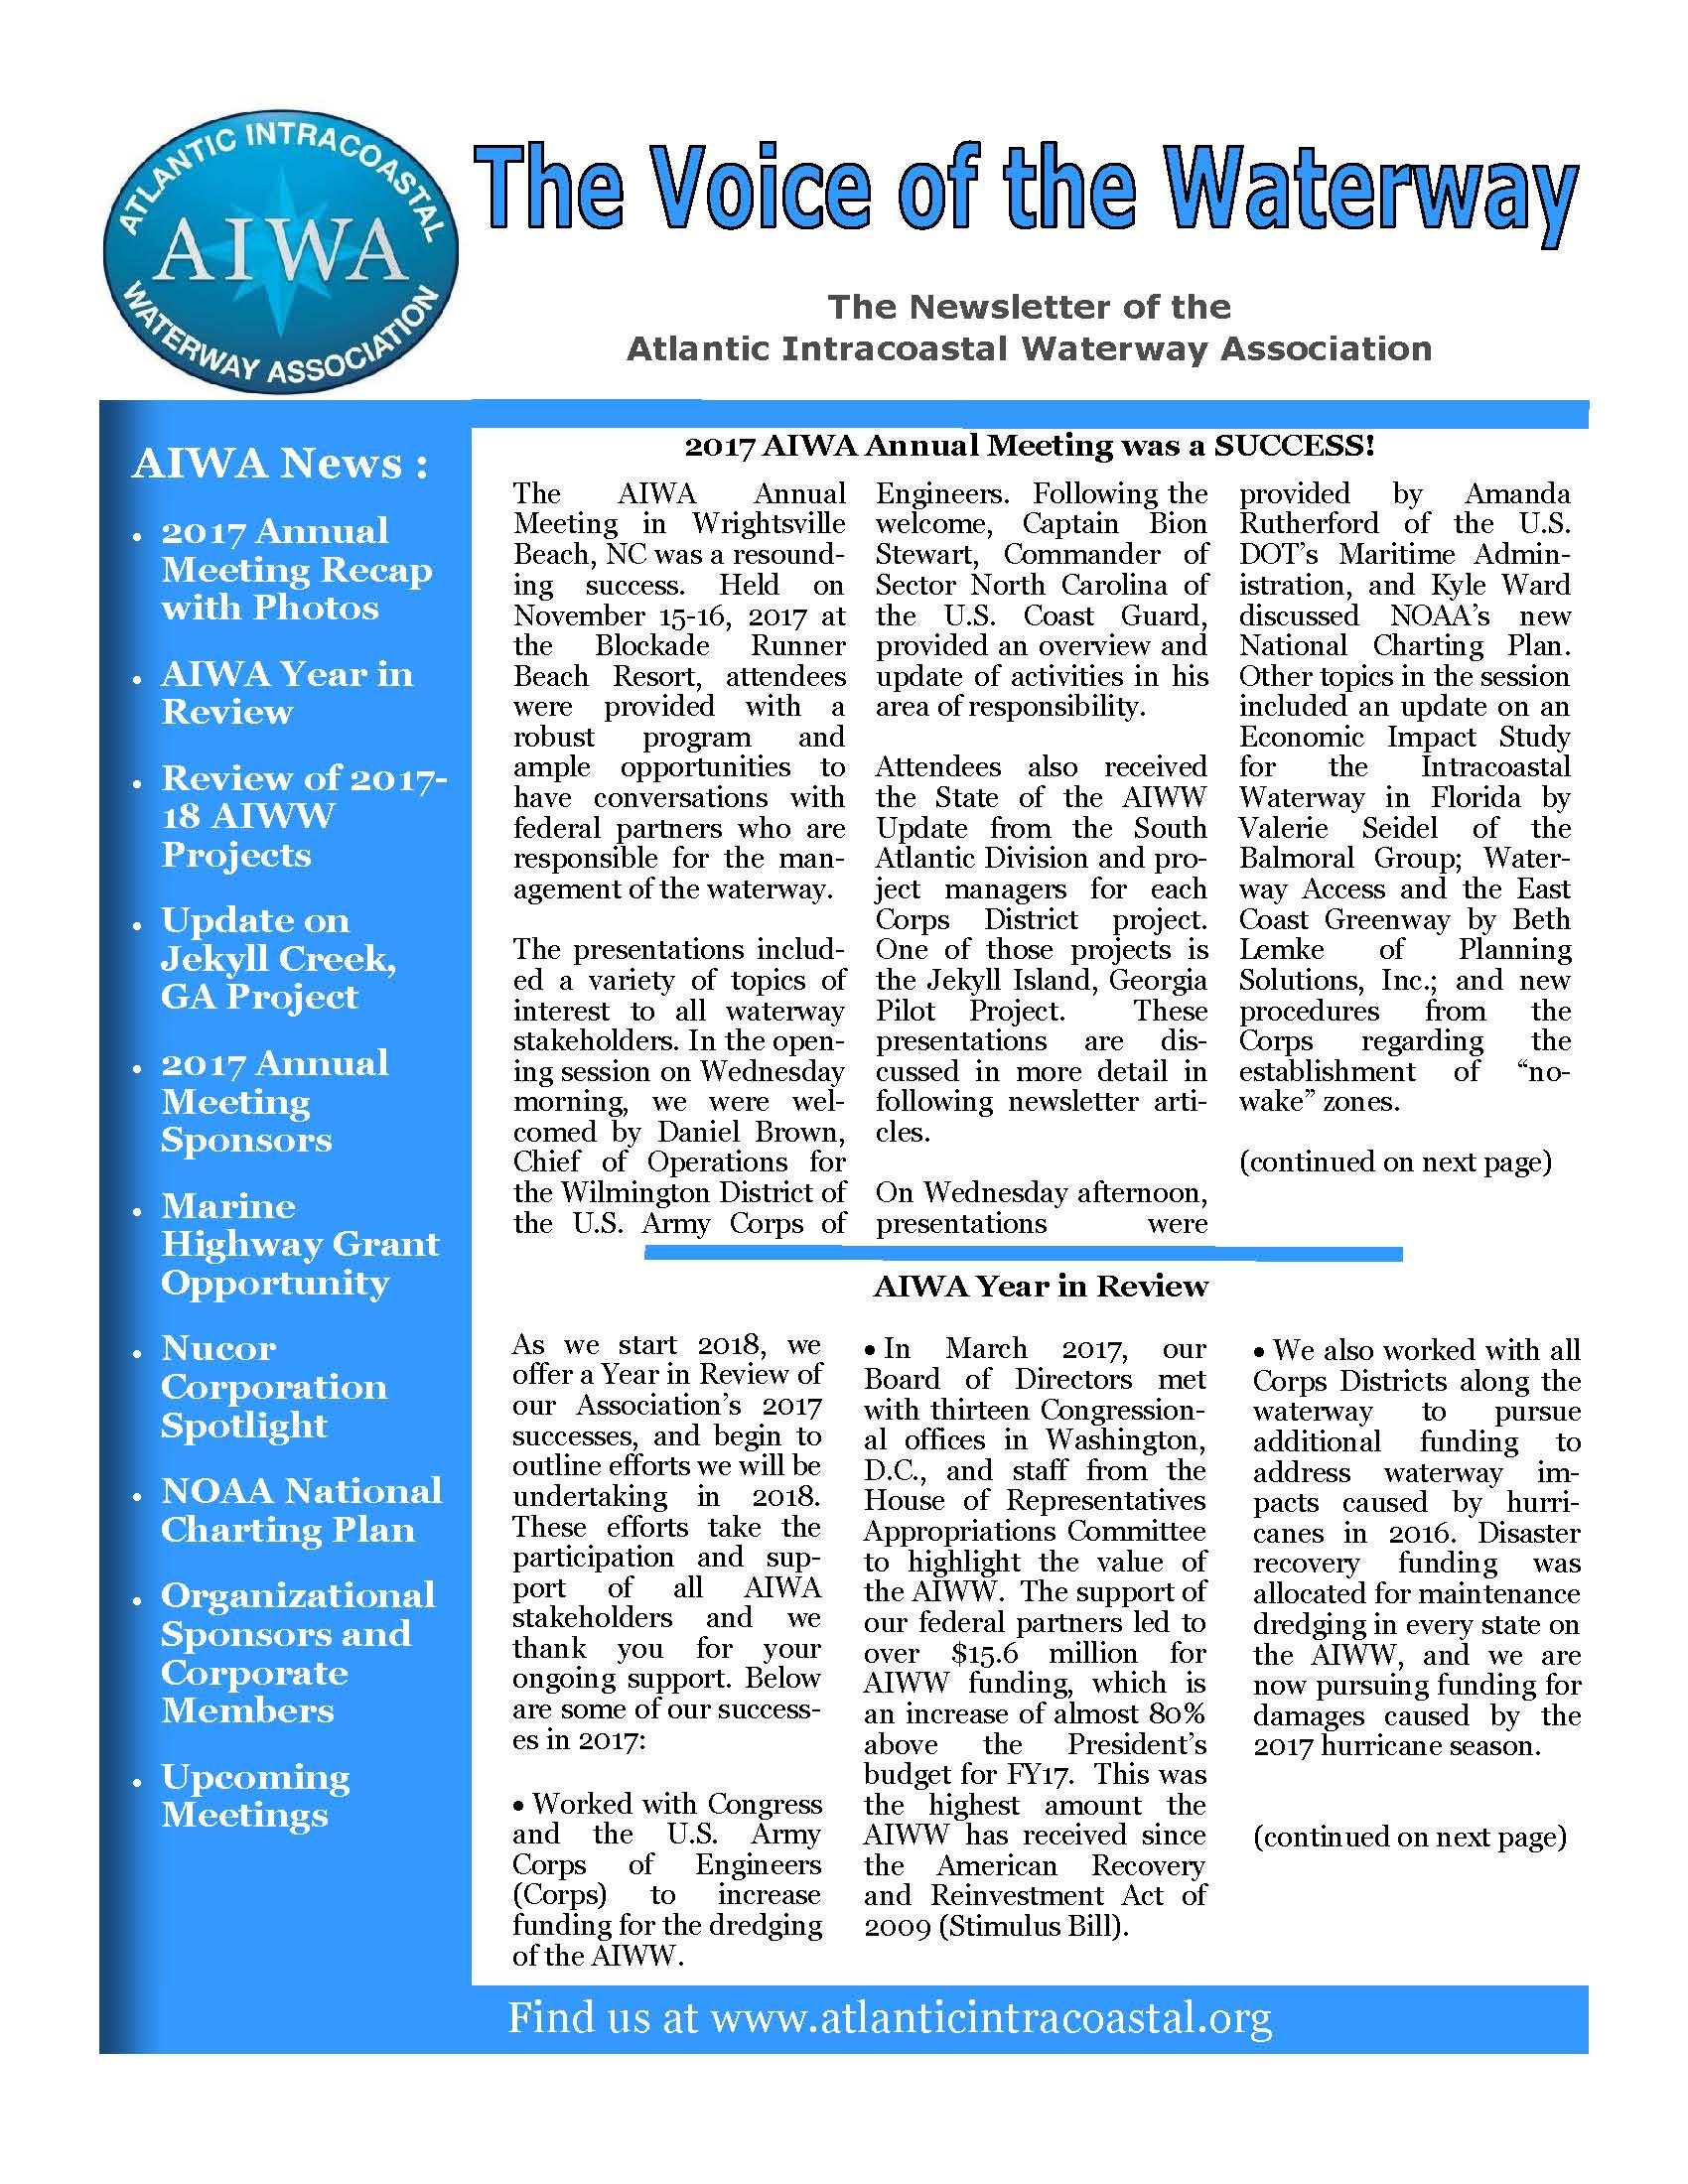 AIWA Newsletter January 2018.jpg